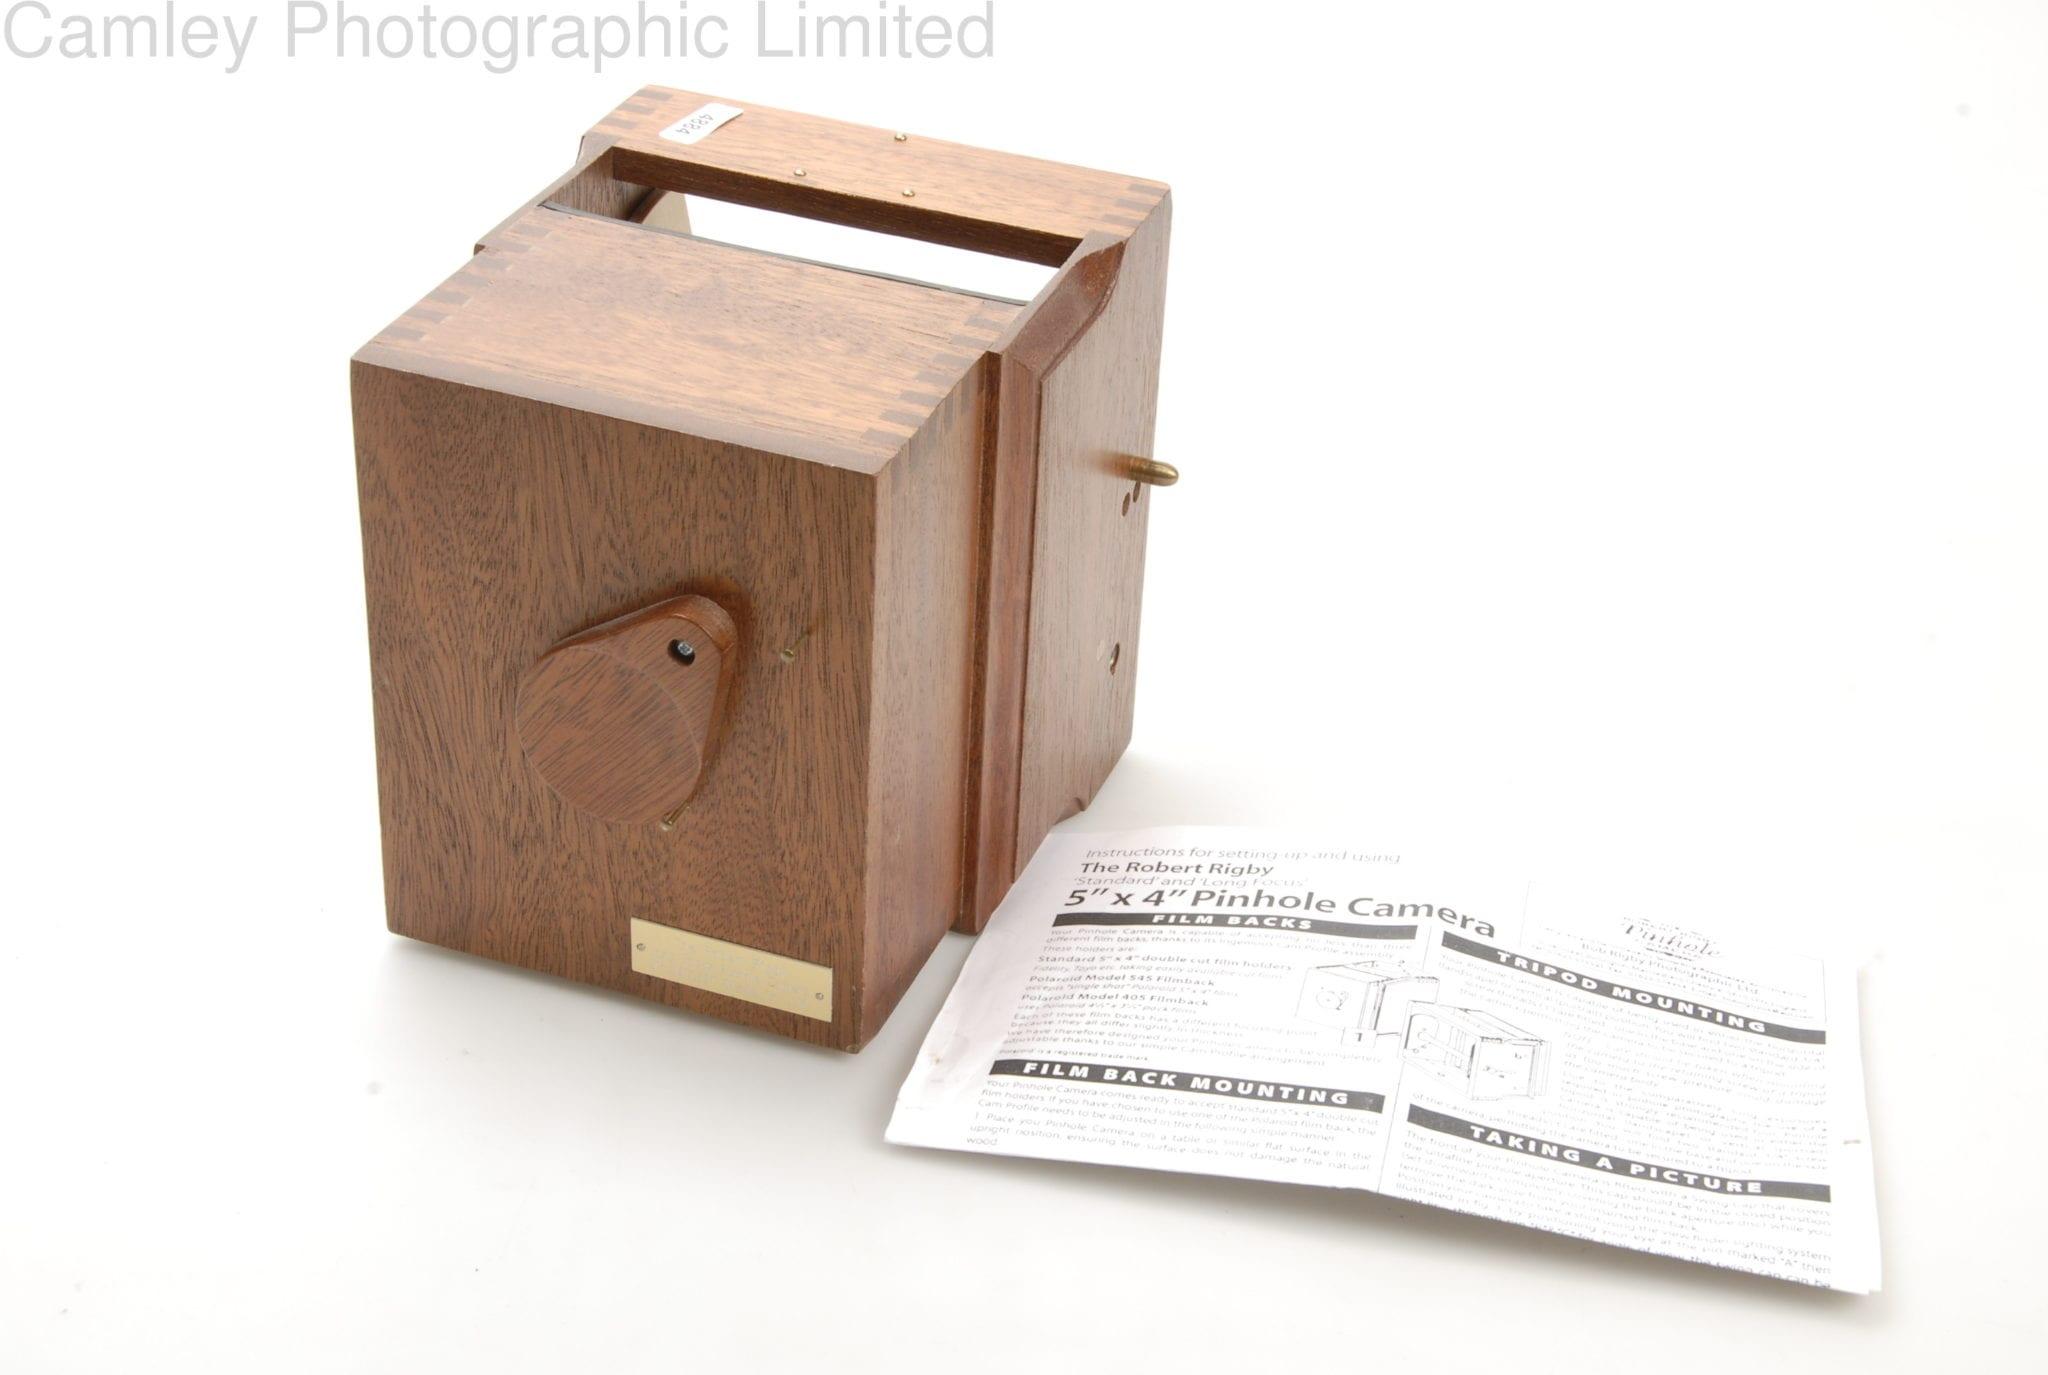 Hasselblad pdf pinhole